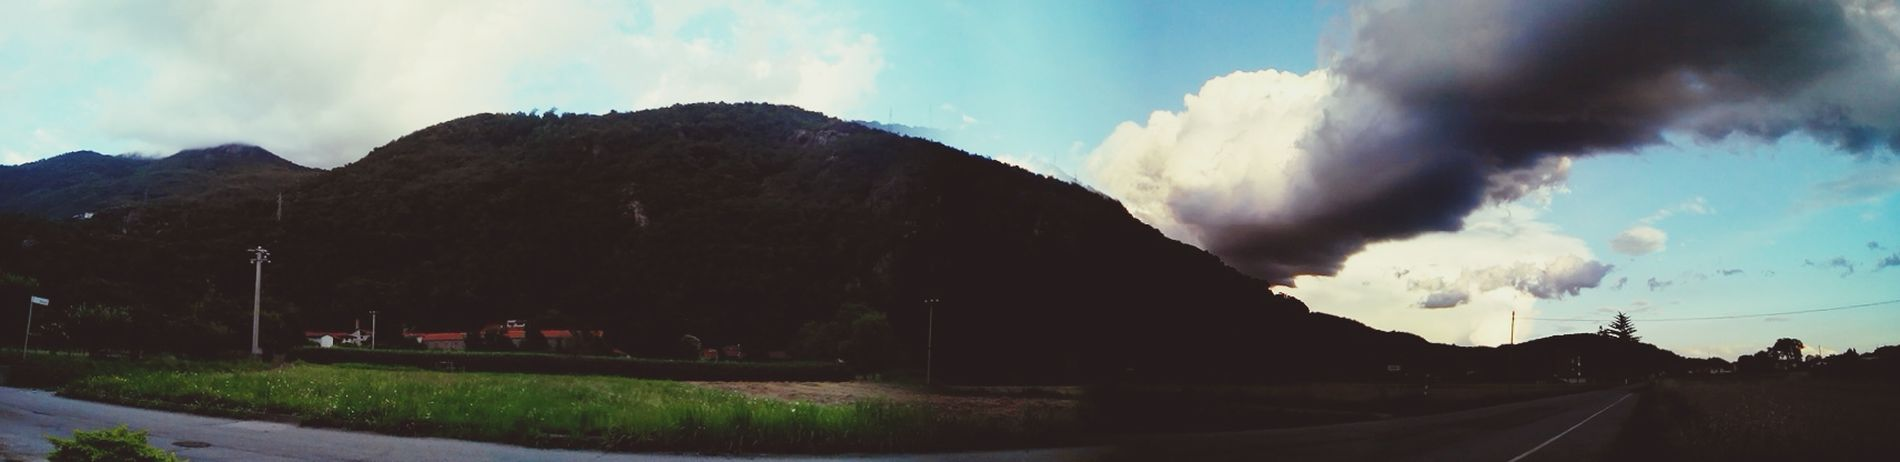 Vacation Time Photo♡ Hello World Enjoying Life